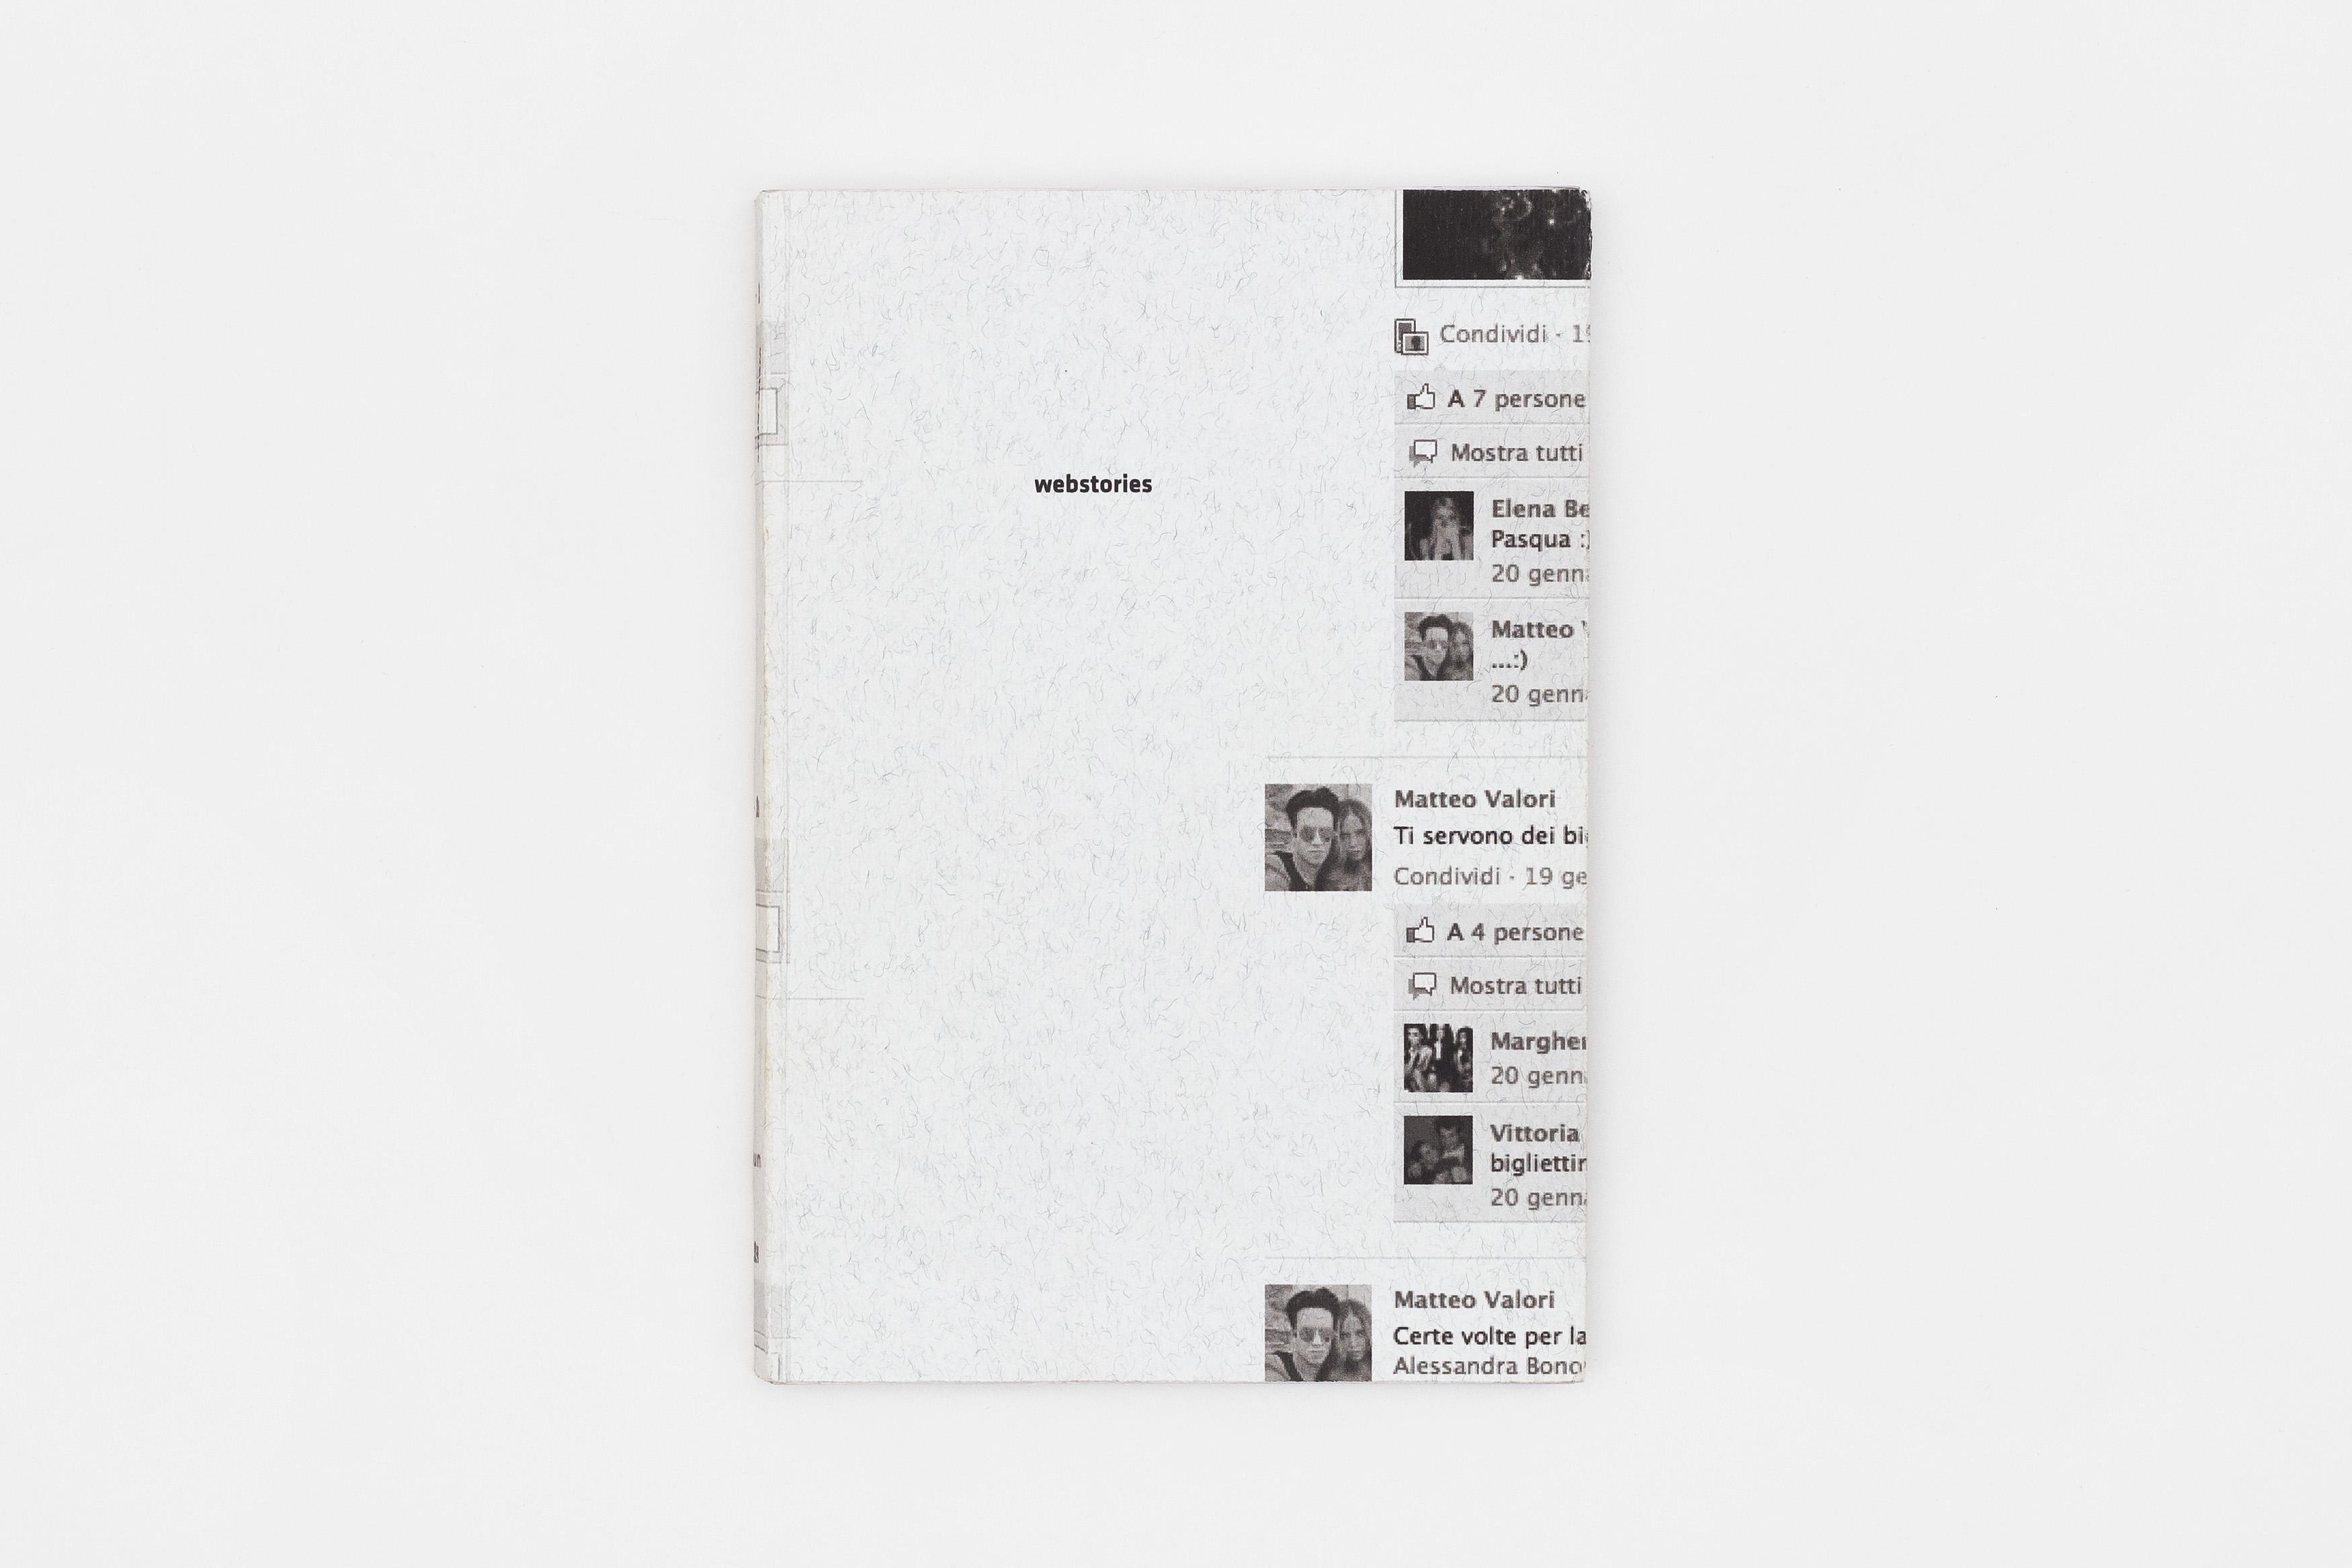 Lorenzo Mazzali - Webstories / Triennio ISIA